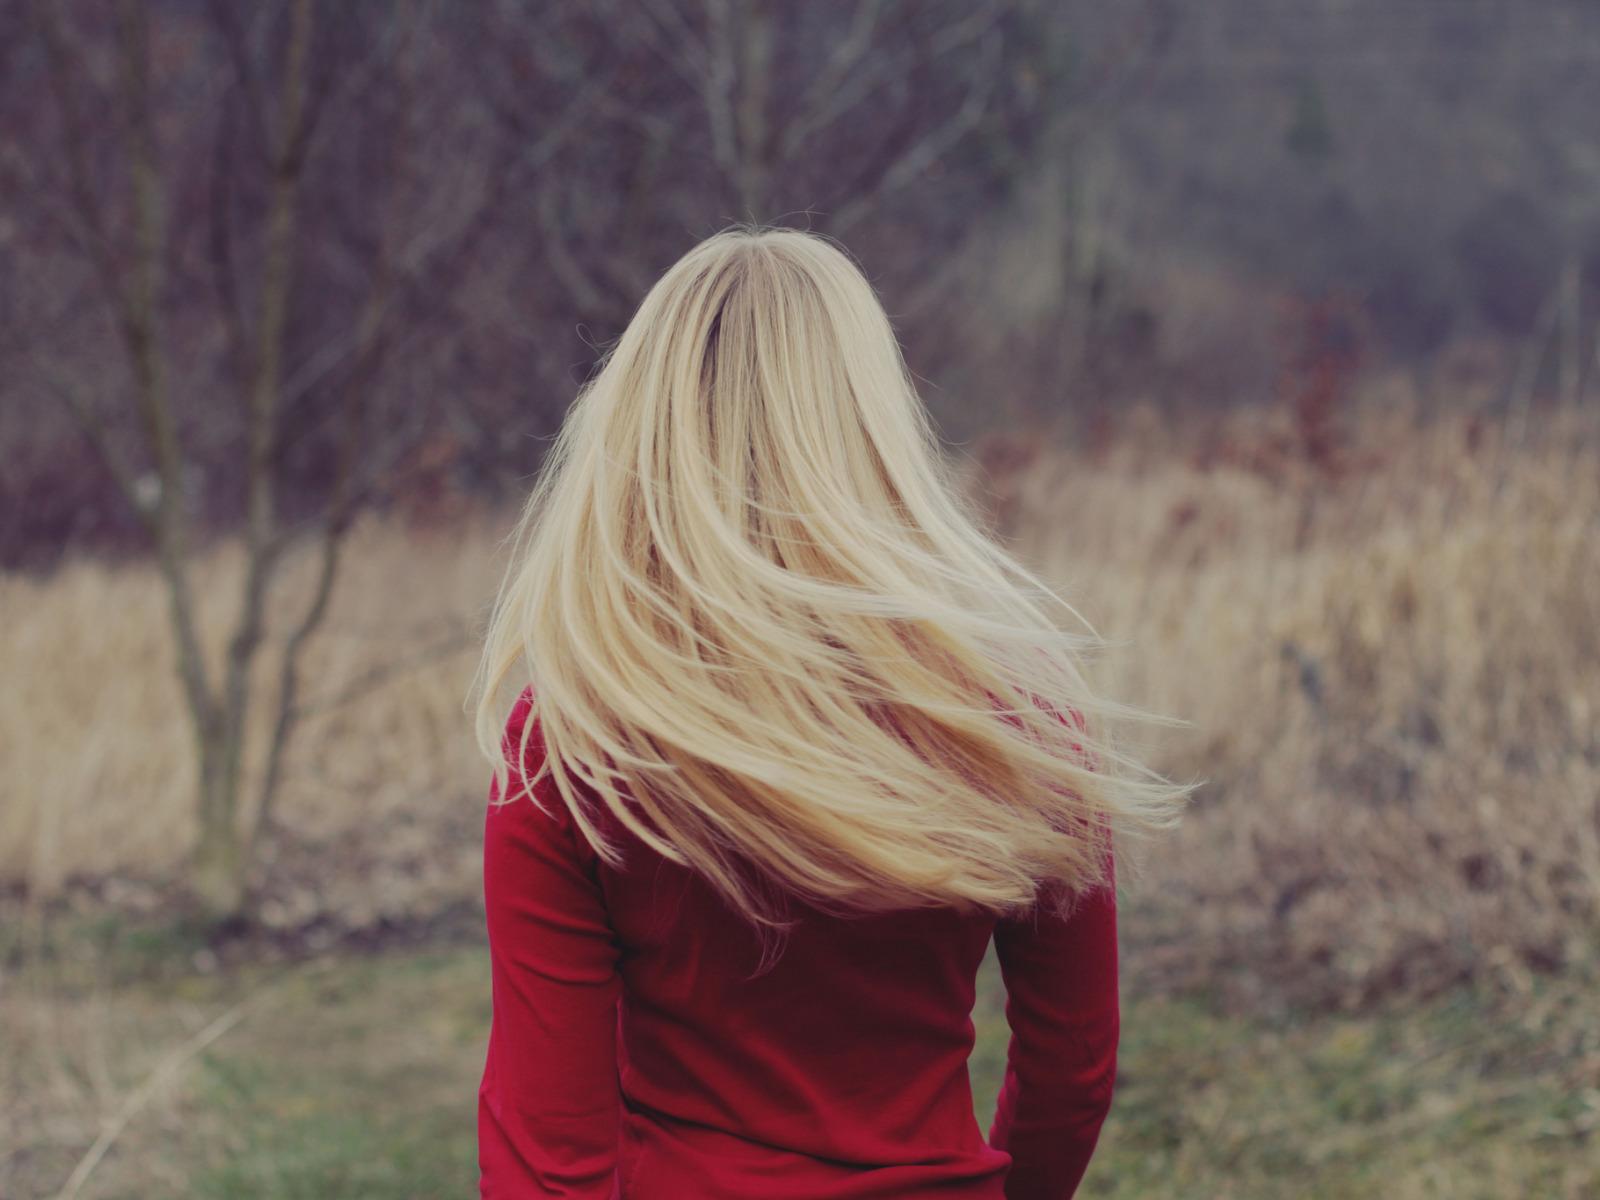 Фото блондинок без лица зимой на аву